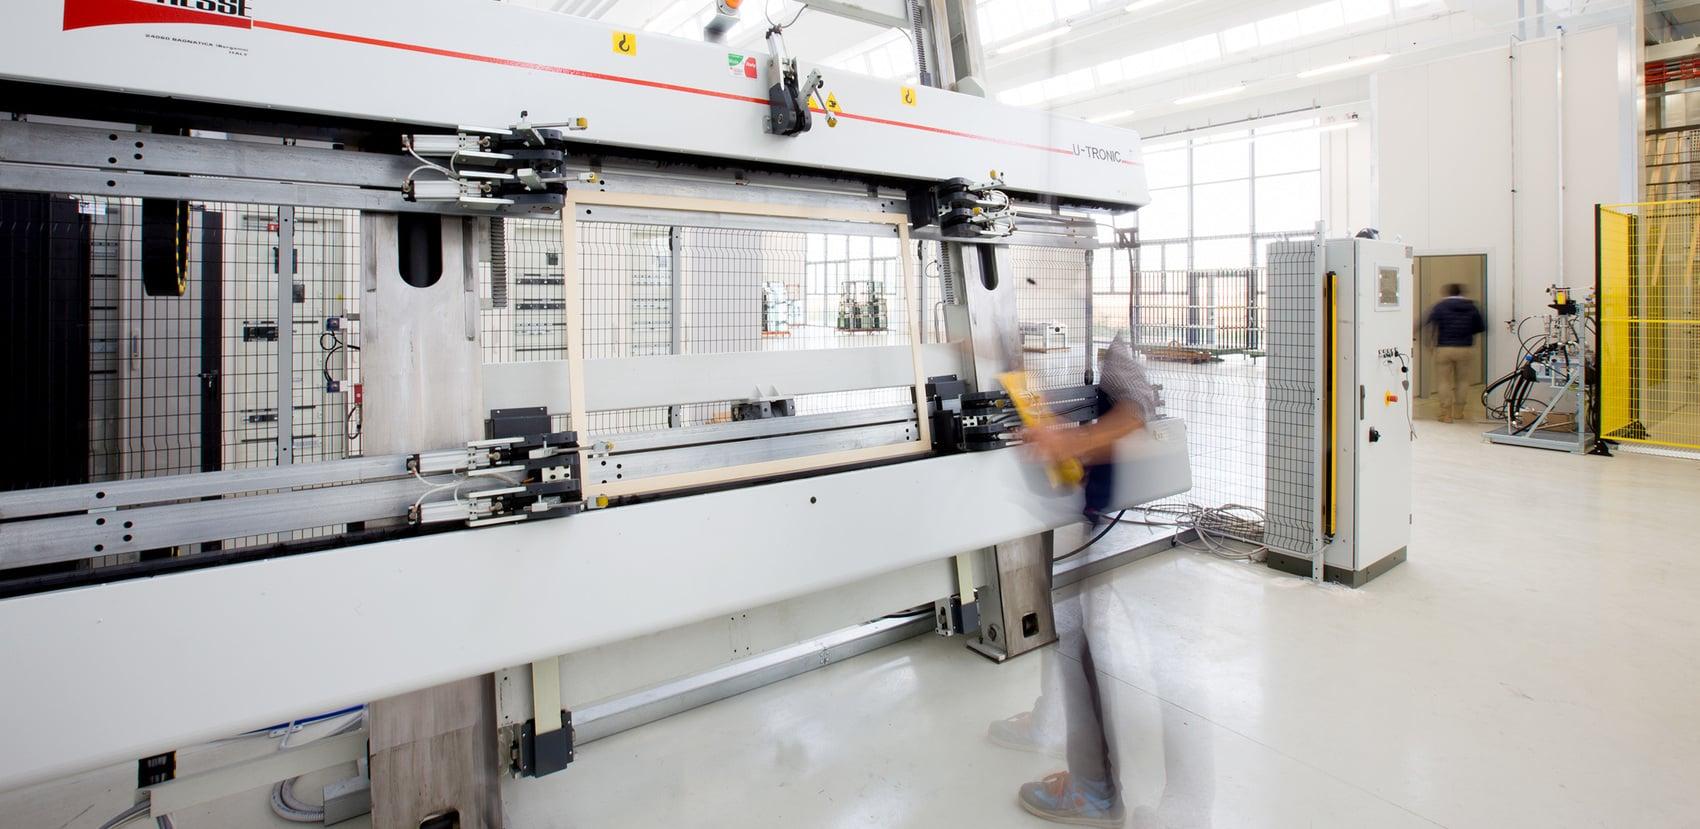 Houtverwerking in de fabriek in Oppeano.